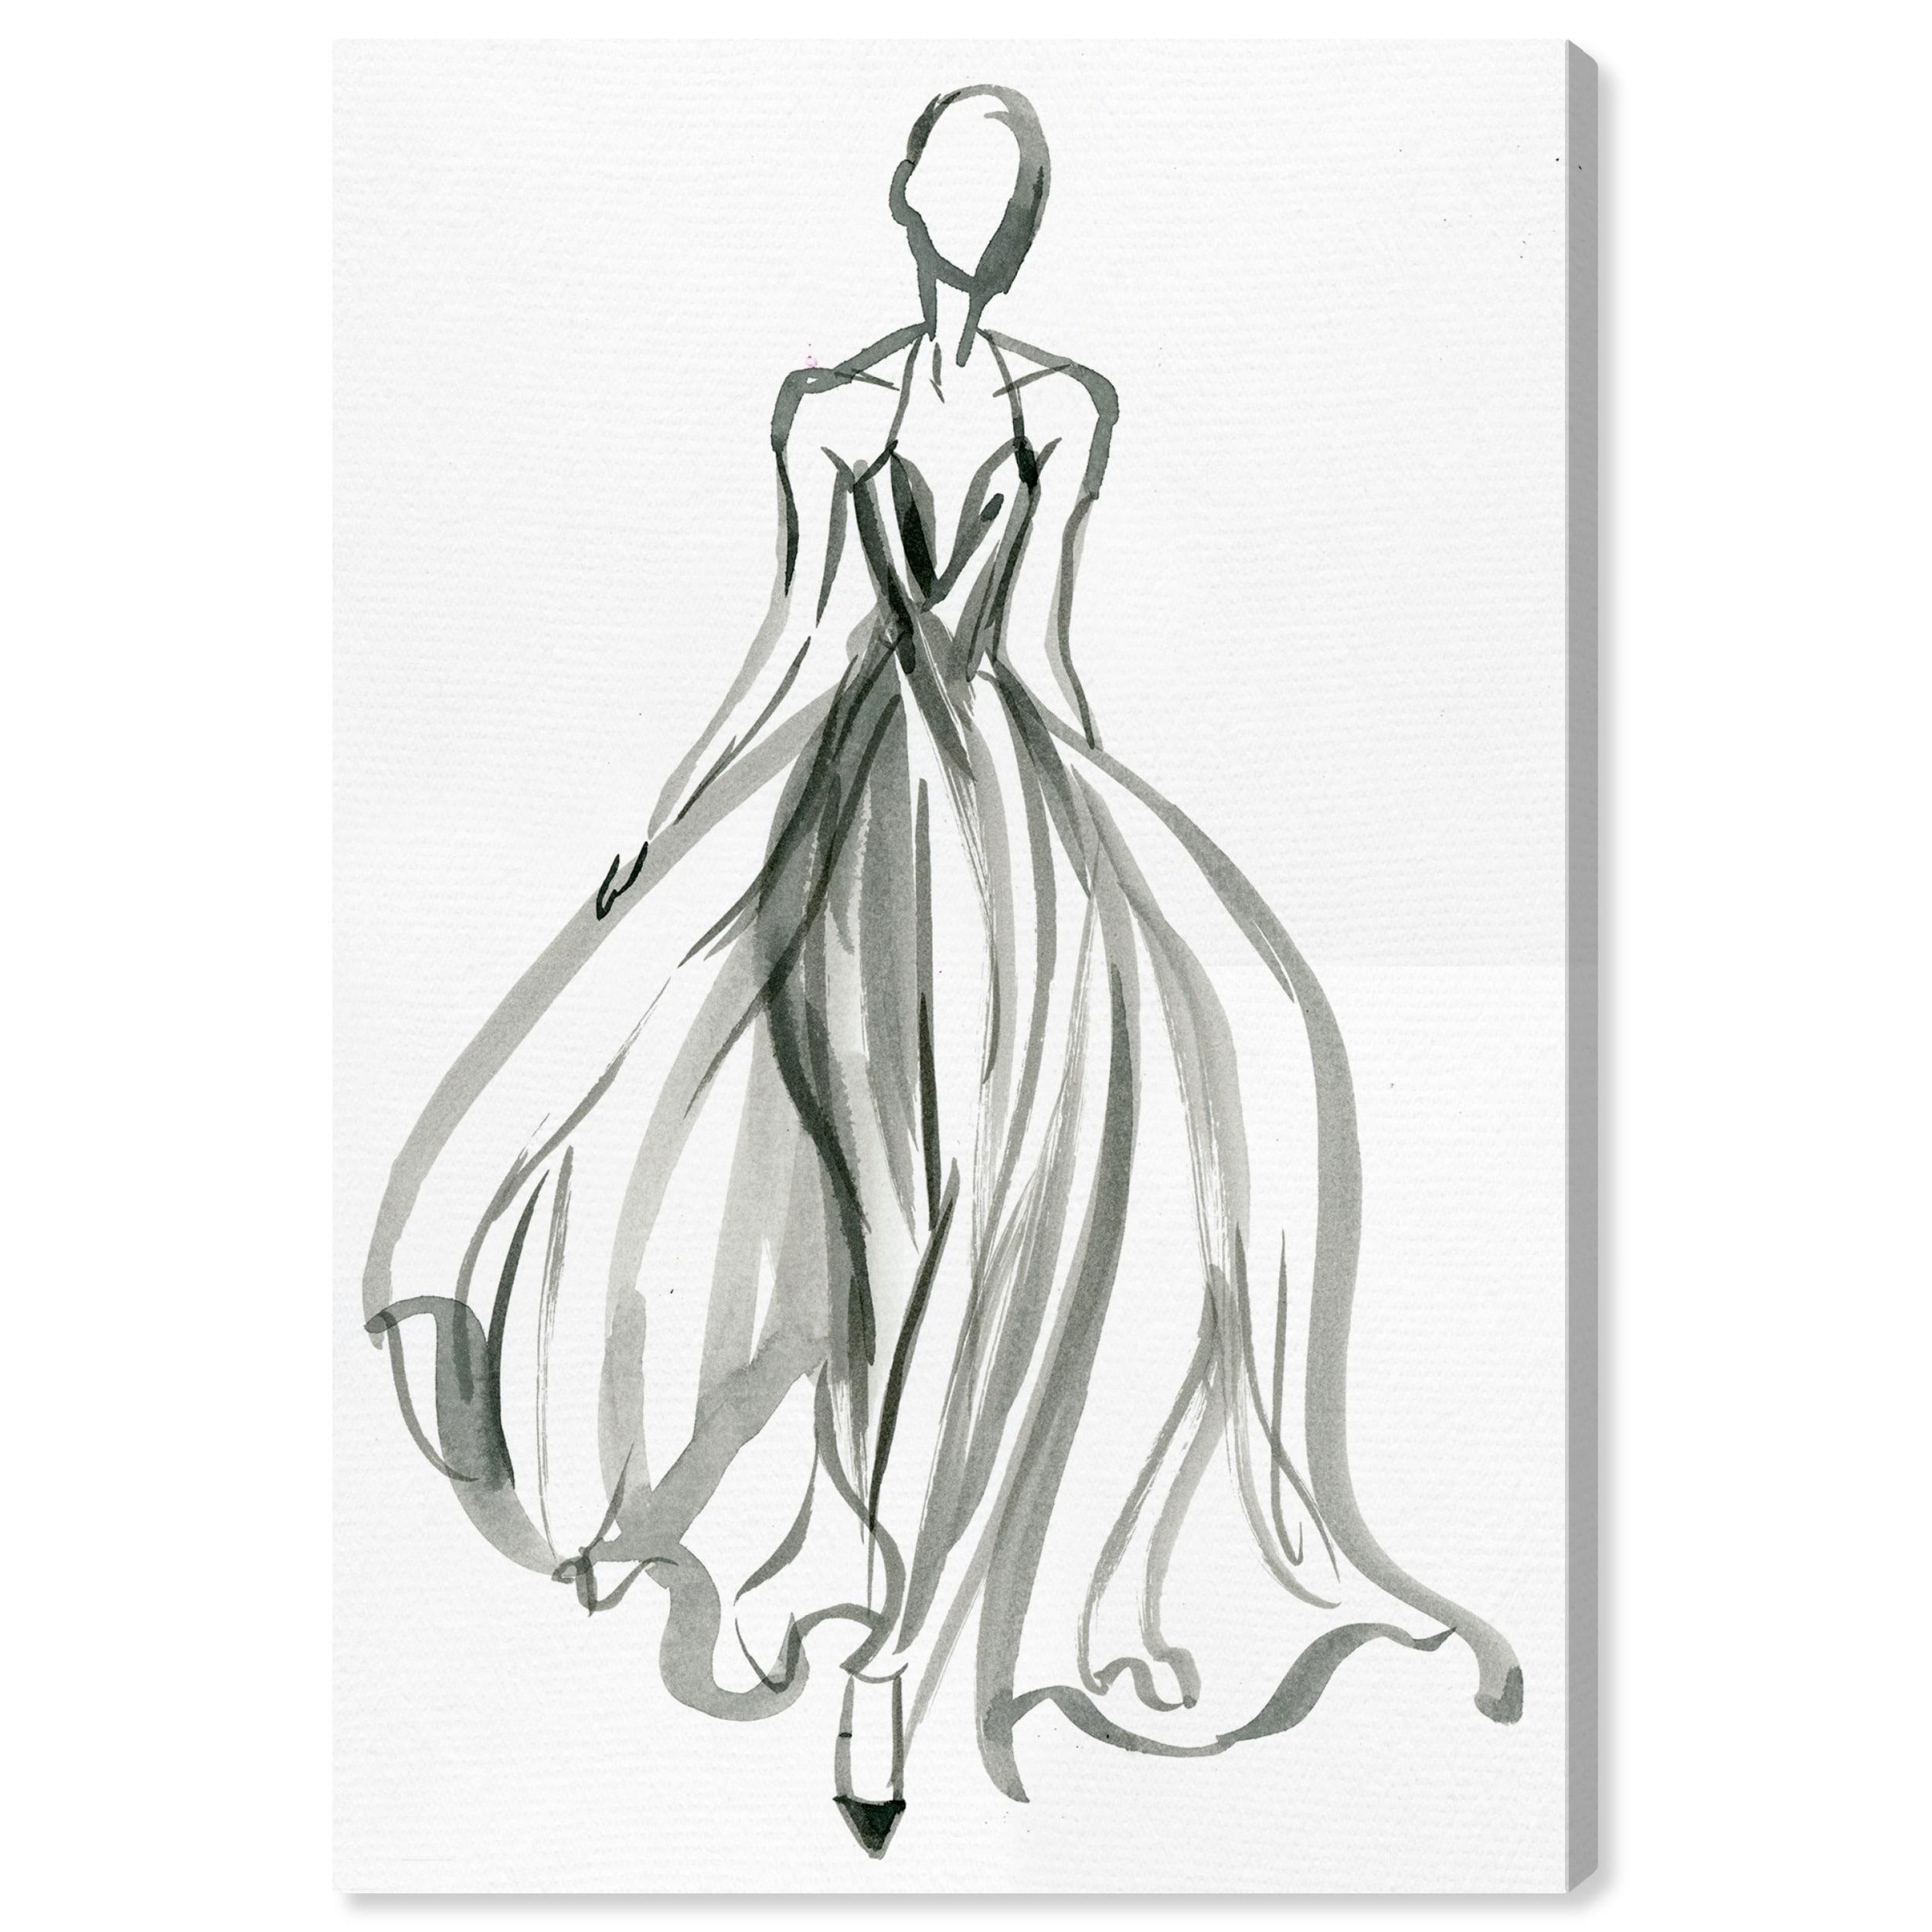 Shop Oliver Gal Elegant Dress Ink Iv Fashion And Glam Wall Art Canvas Print Black White Overstock 28596233